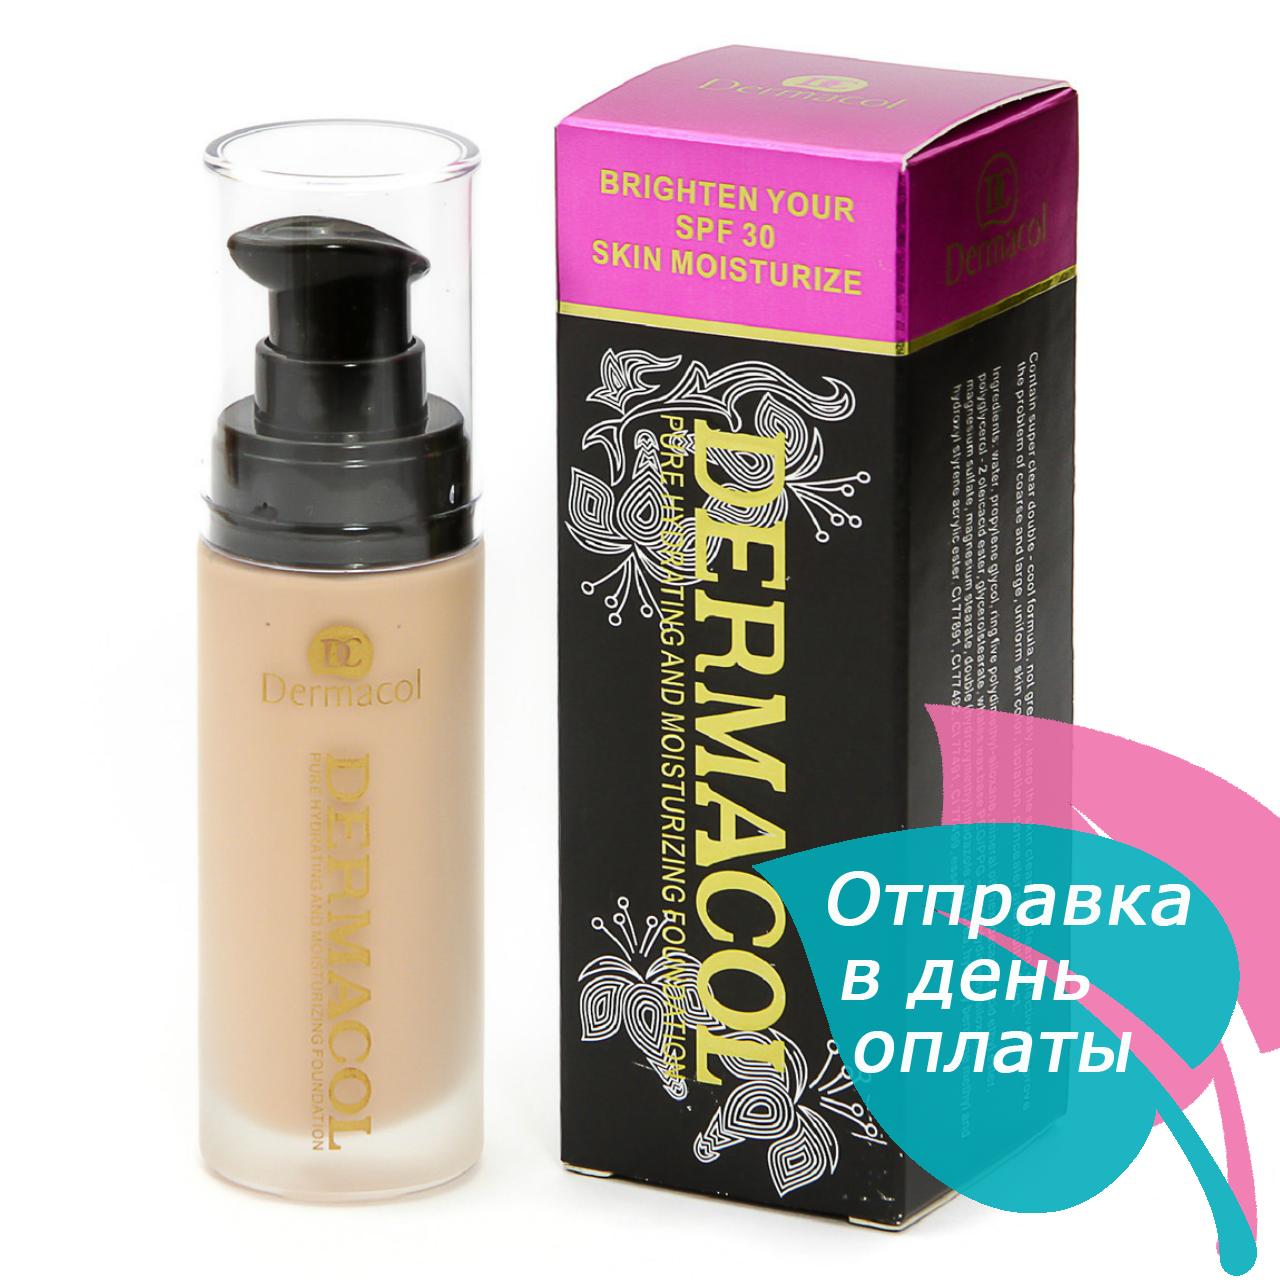 Тональный крем Dermacol Bright your SPF 30 skin moisturize